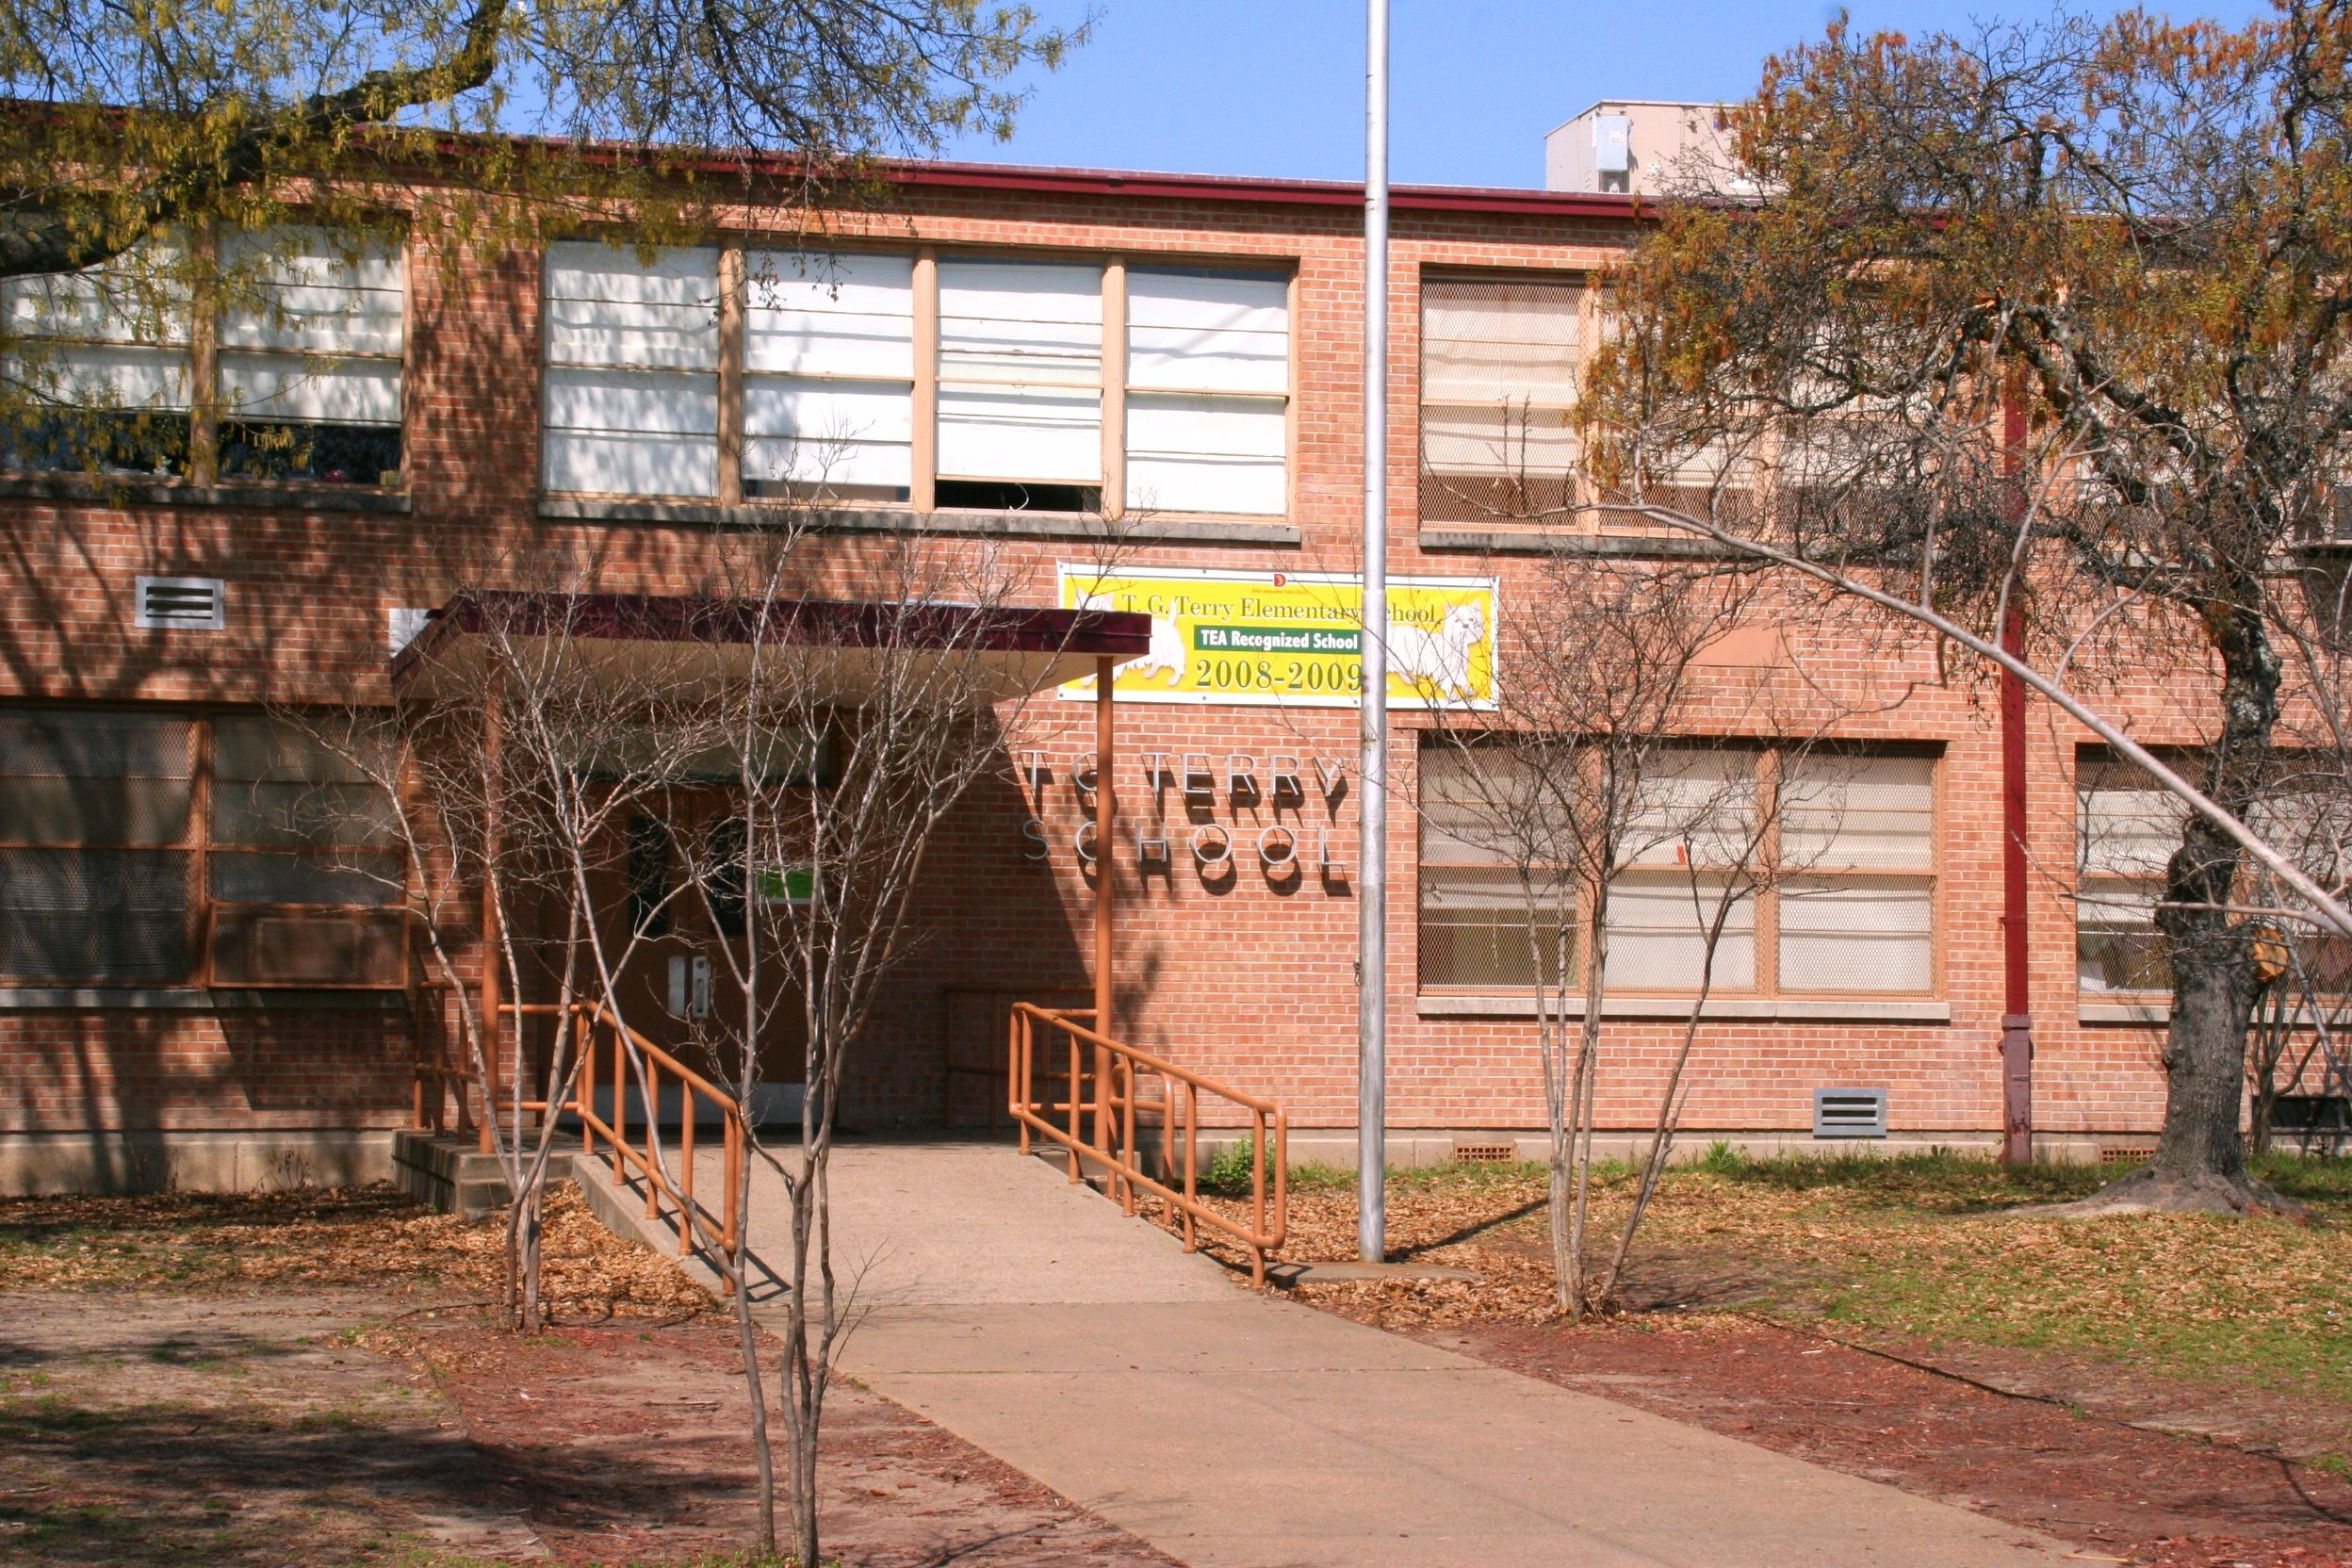 T.G. Terry Elementary School | Elementary Schools (M-Z) | Pinterest ...